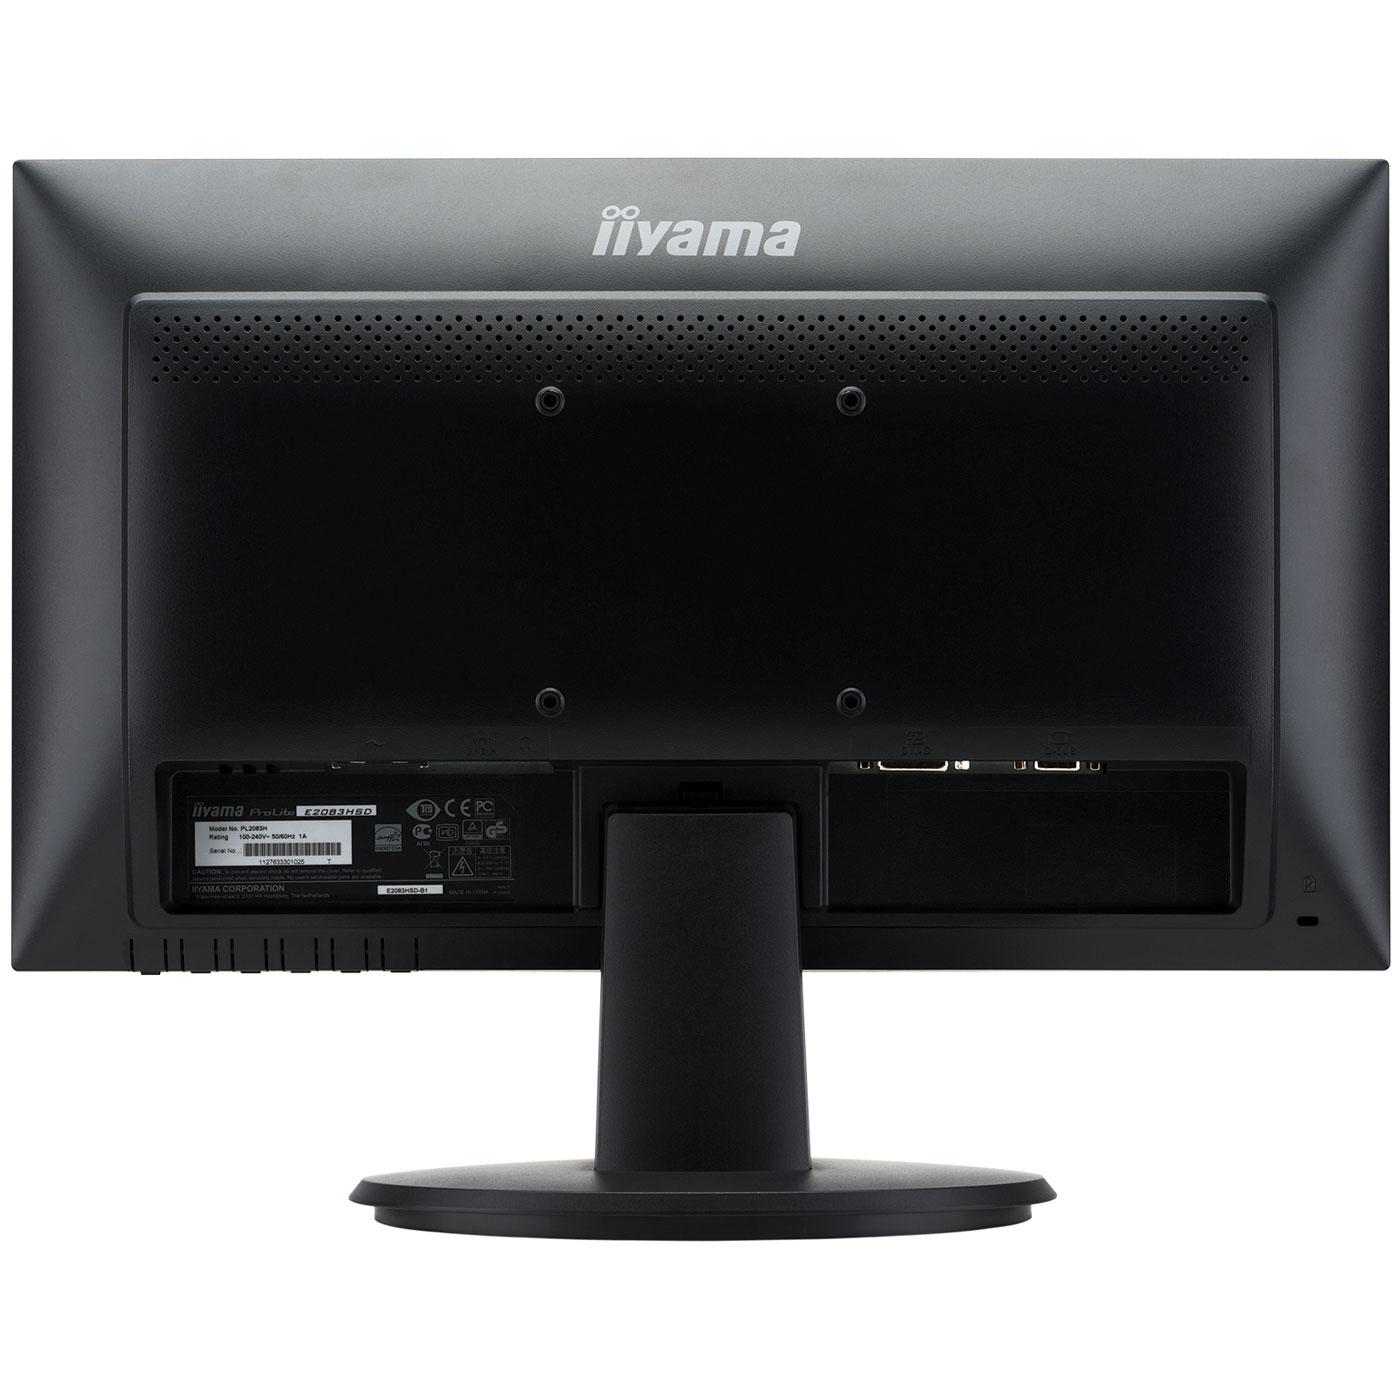 Iiyama 19 5 led prolite e2083hsd b1 ecran pc iiyama for Eclairage ecran pc